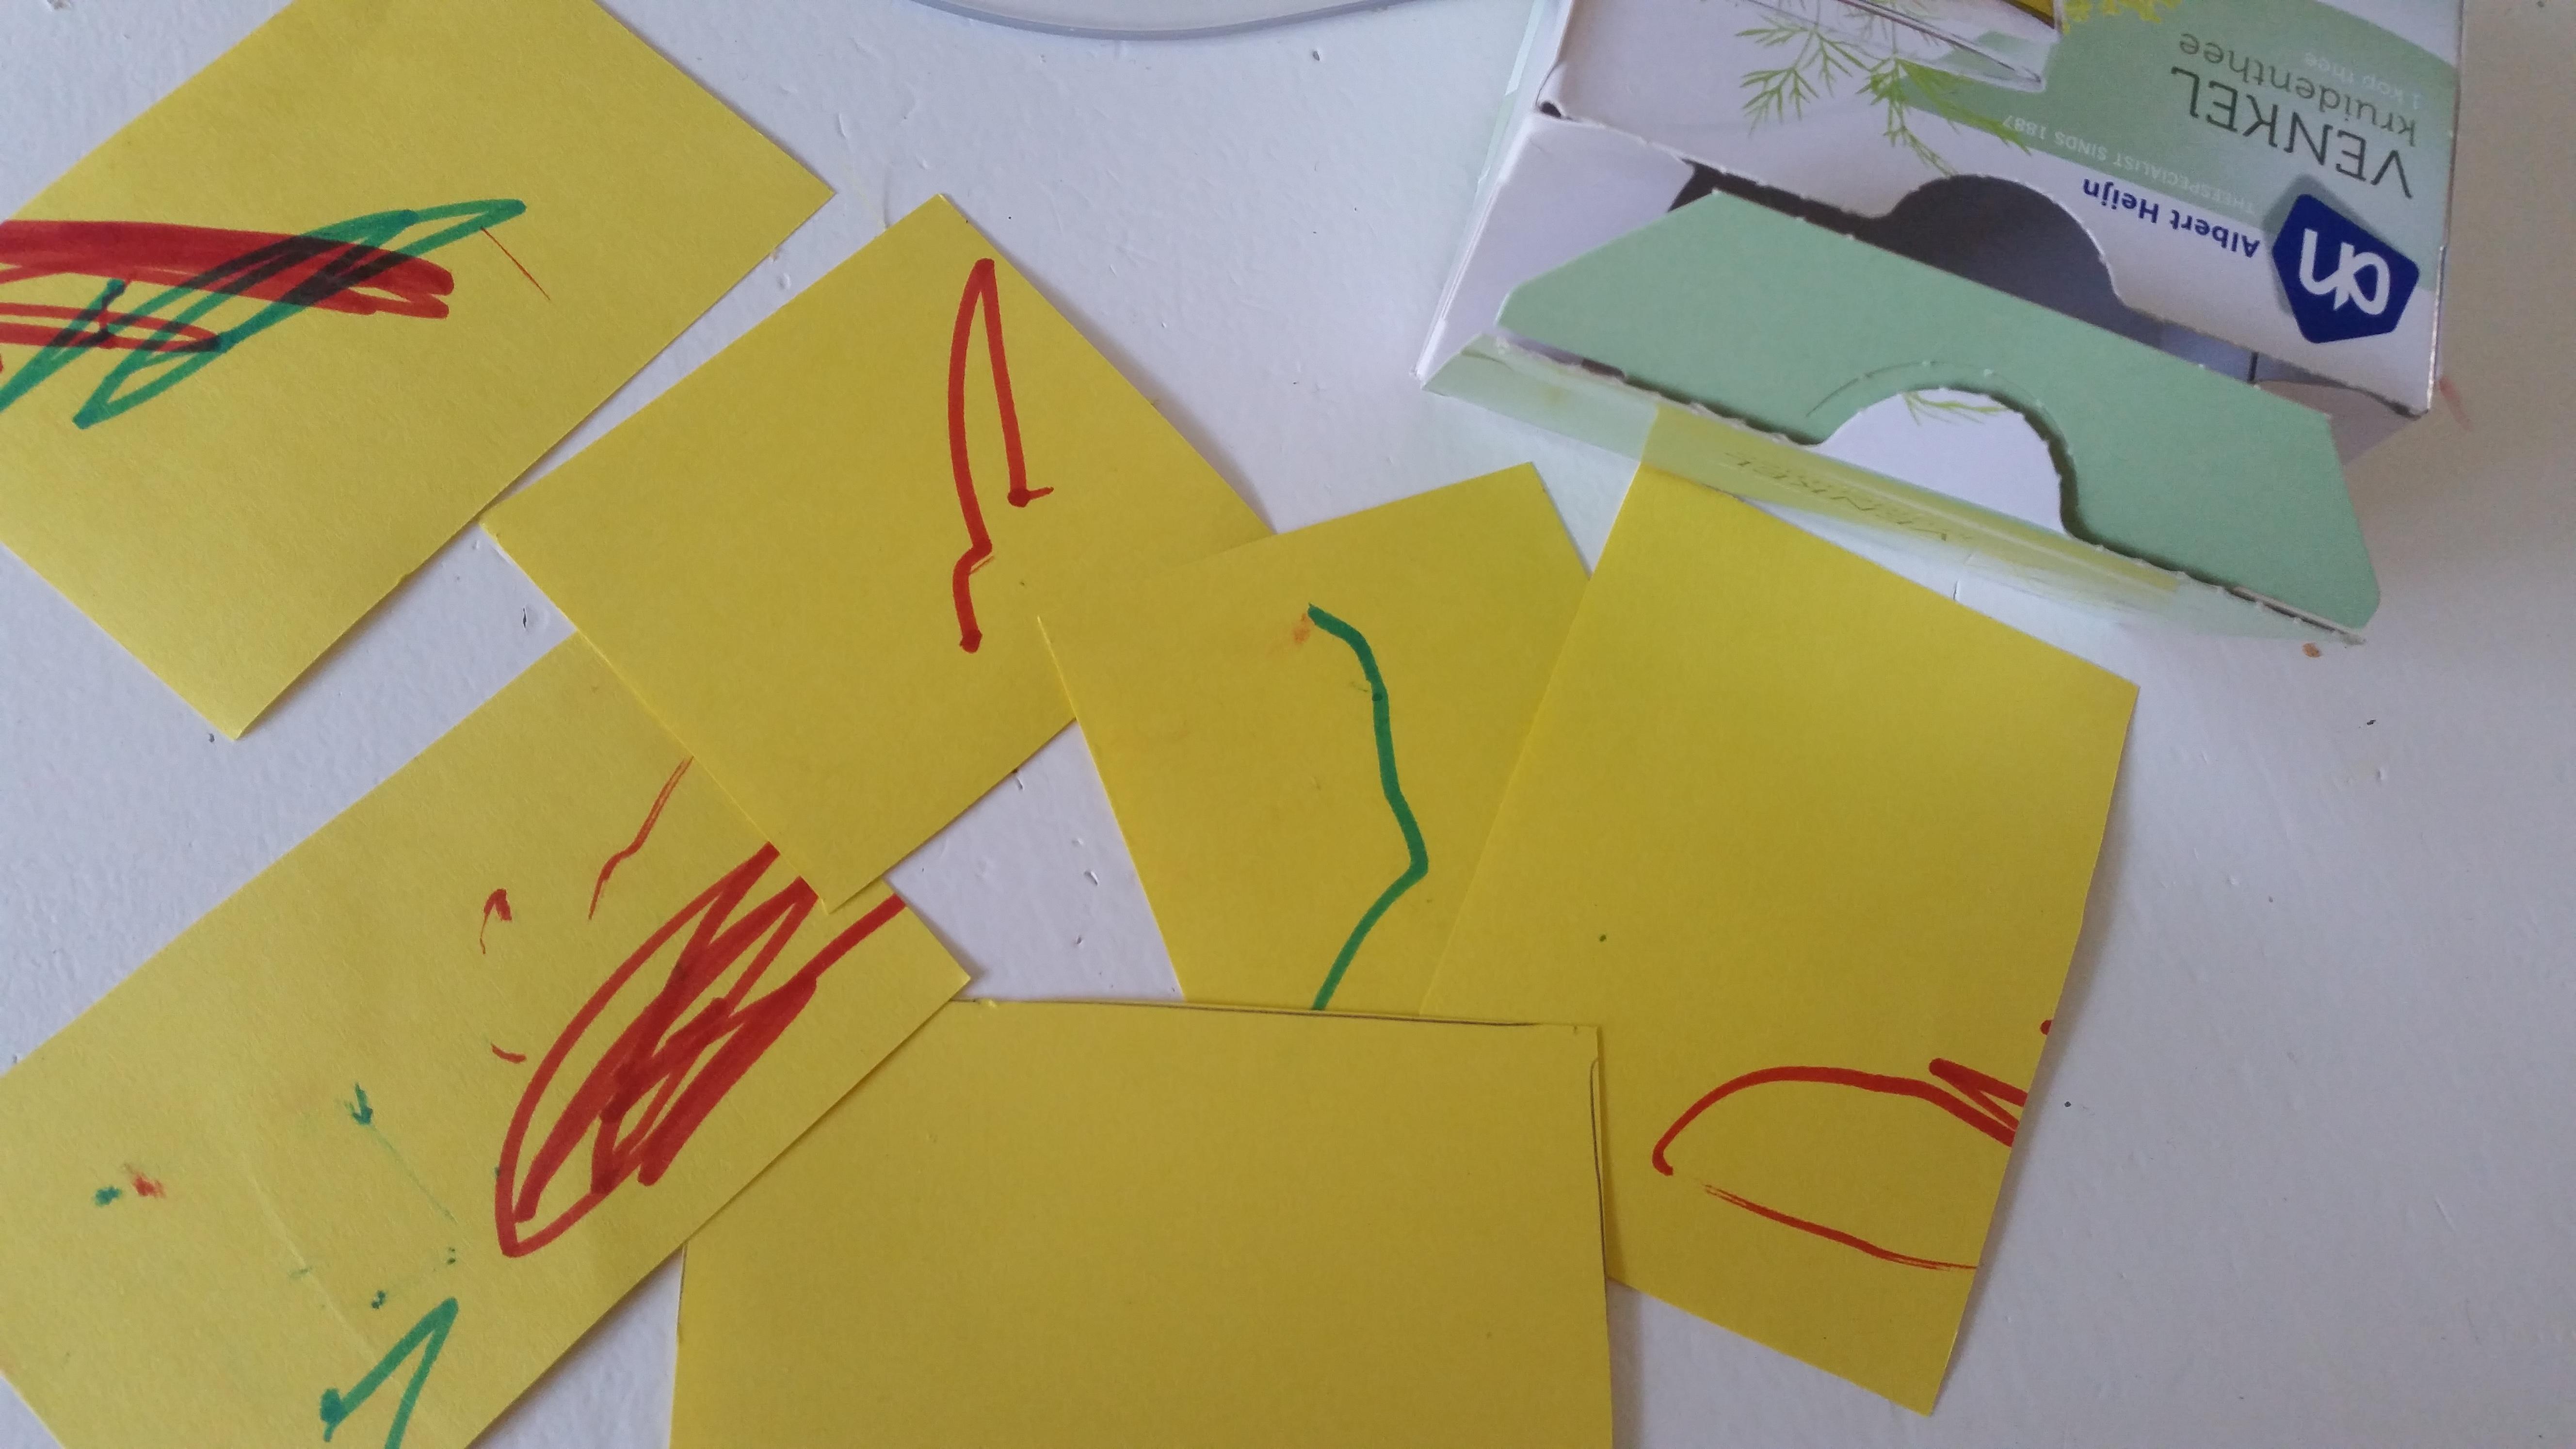 5-16-vaderdag-knutselwerkje-vanaf-1-jaar-peuter-kleuter-dreumes-baby-leuk=puzzel-origineel-mama-moeder-papa-vader-nanny-amsterdam-doosje